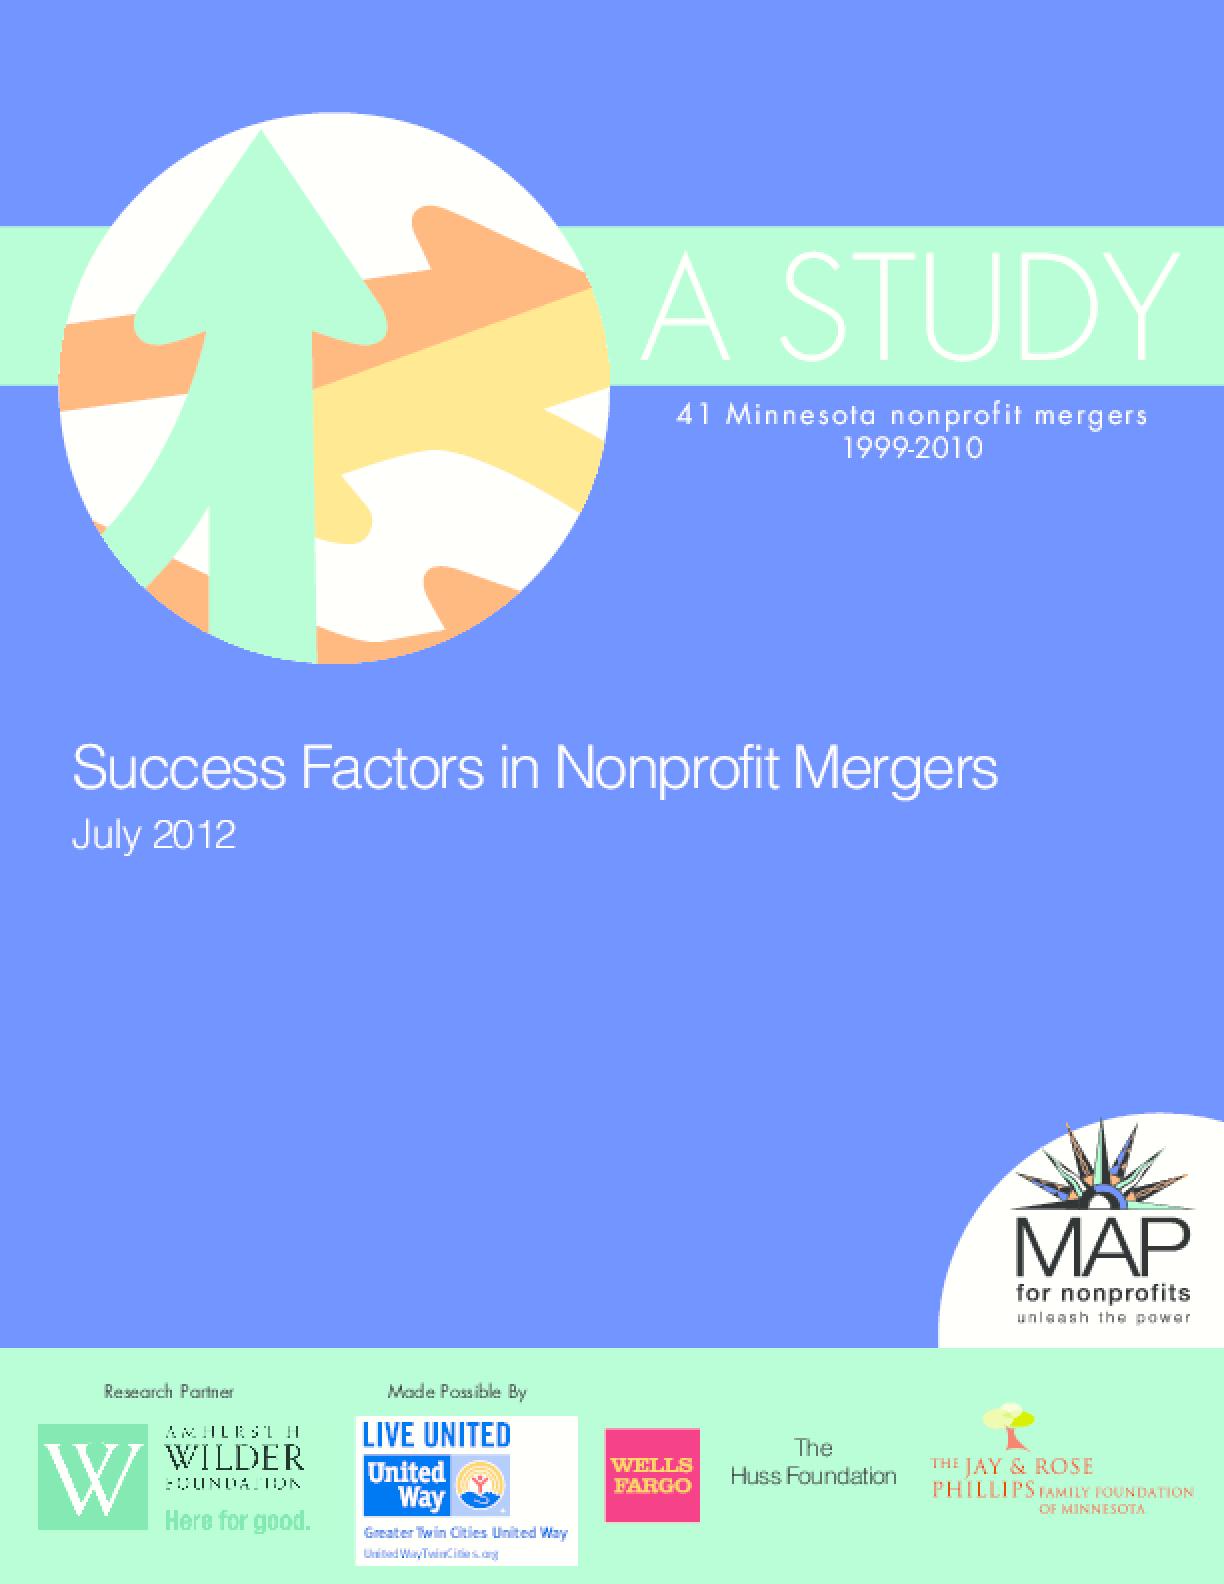 Success Factors in Nonprofit Mergers: A Study of 41 Minnesota Nonprofit Mergers 1999-2010